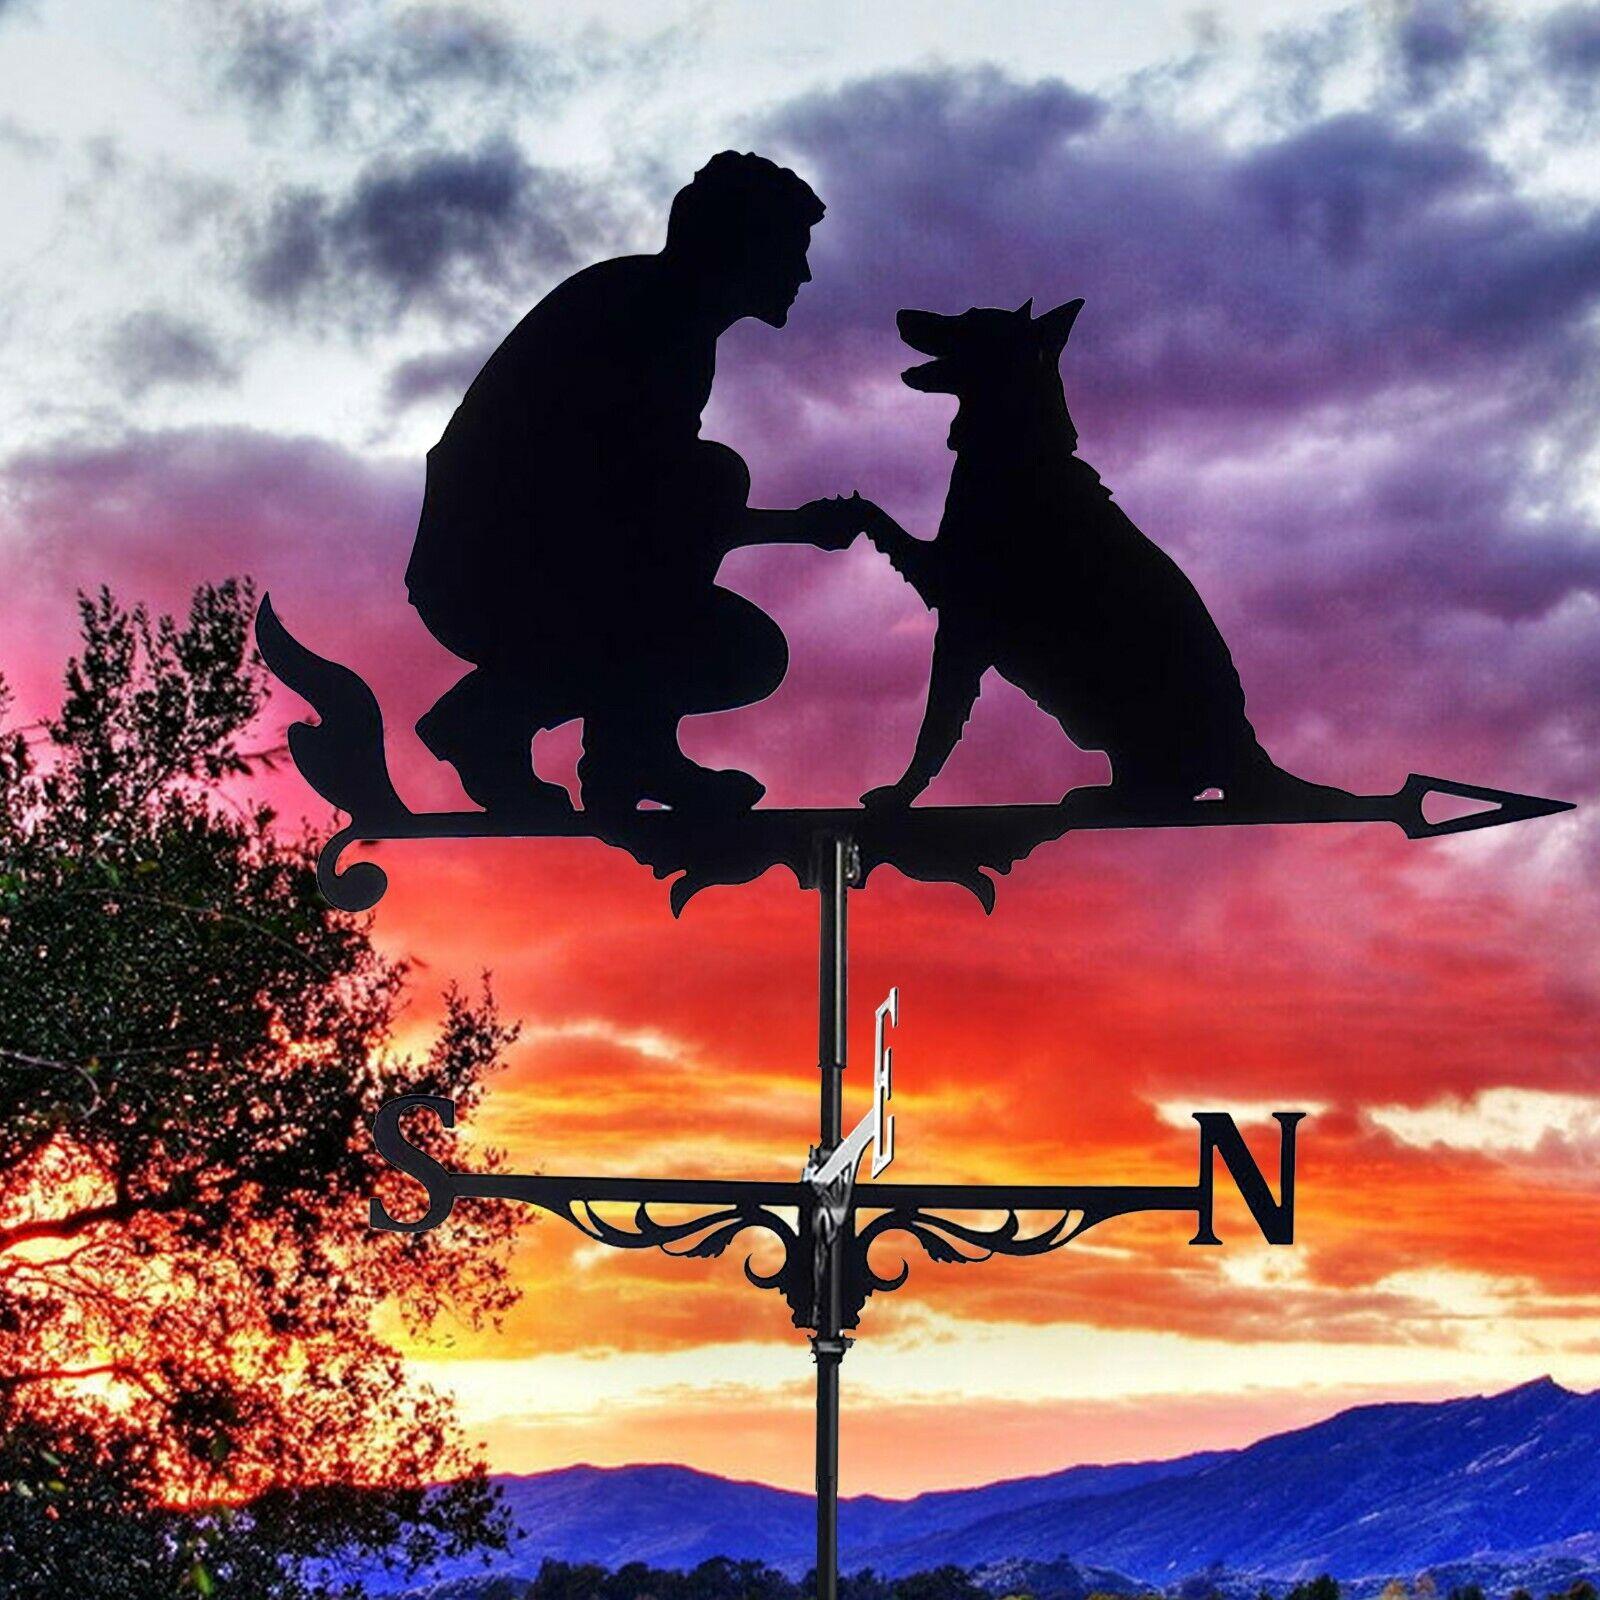 Vintage Metal Weather Vane Outdoor Garden Yard Decor Rooster Dog Witch Halloween